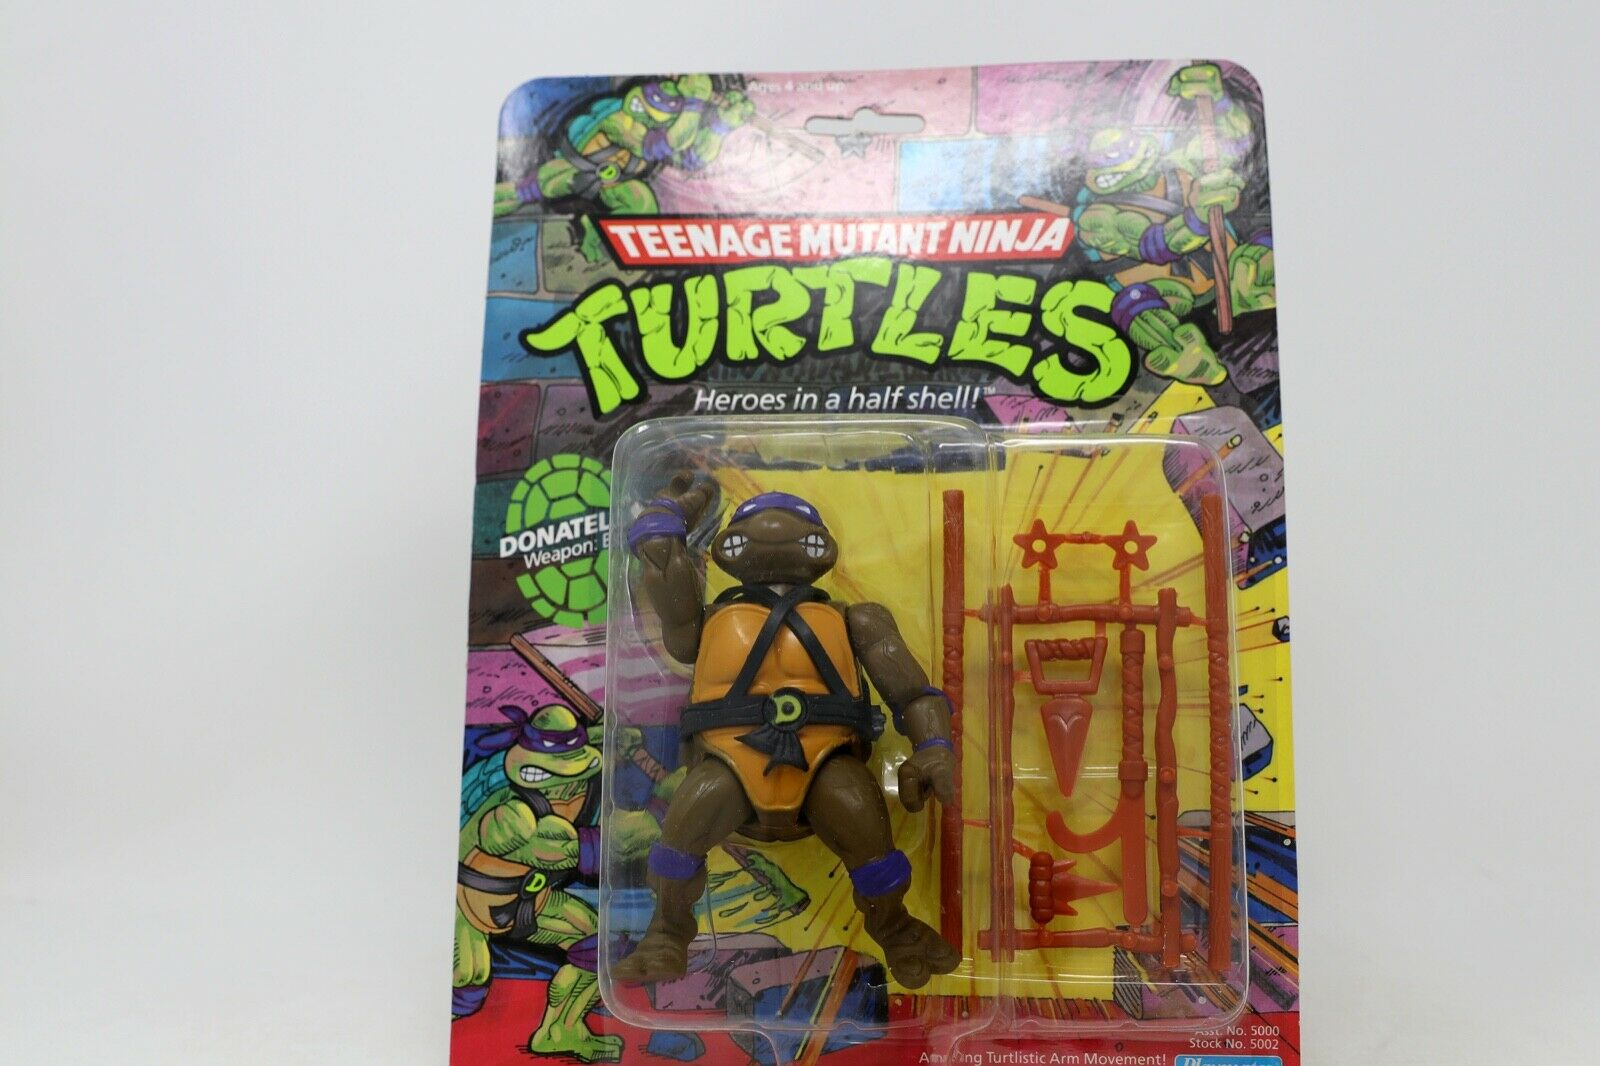 Vintage Jugarmates 1988 Teenage Mutant Ninja Turtles menta en tarjeta Donatello